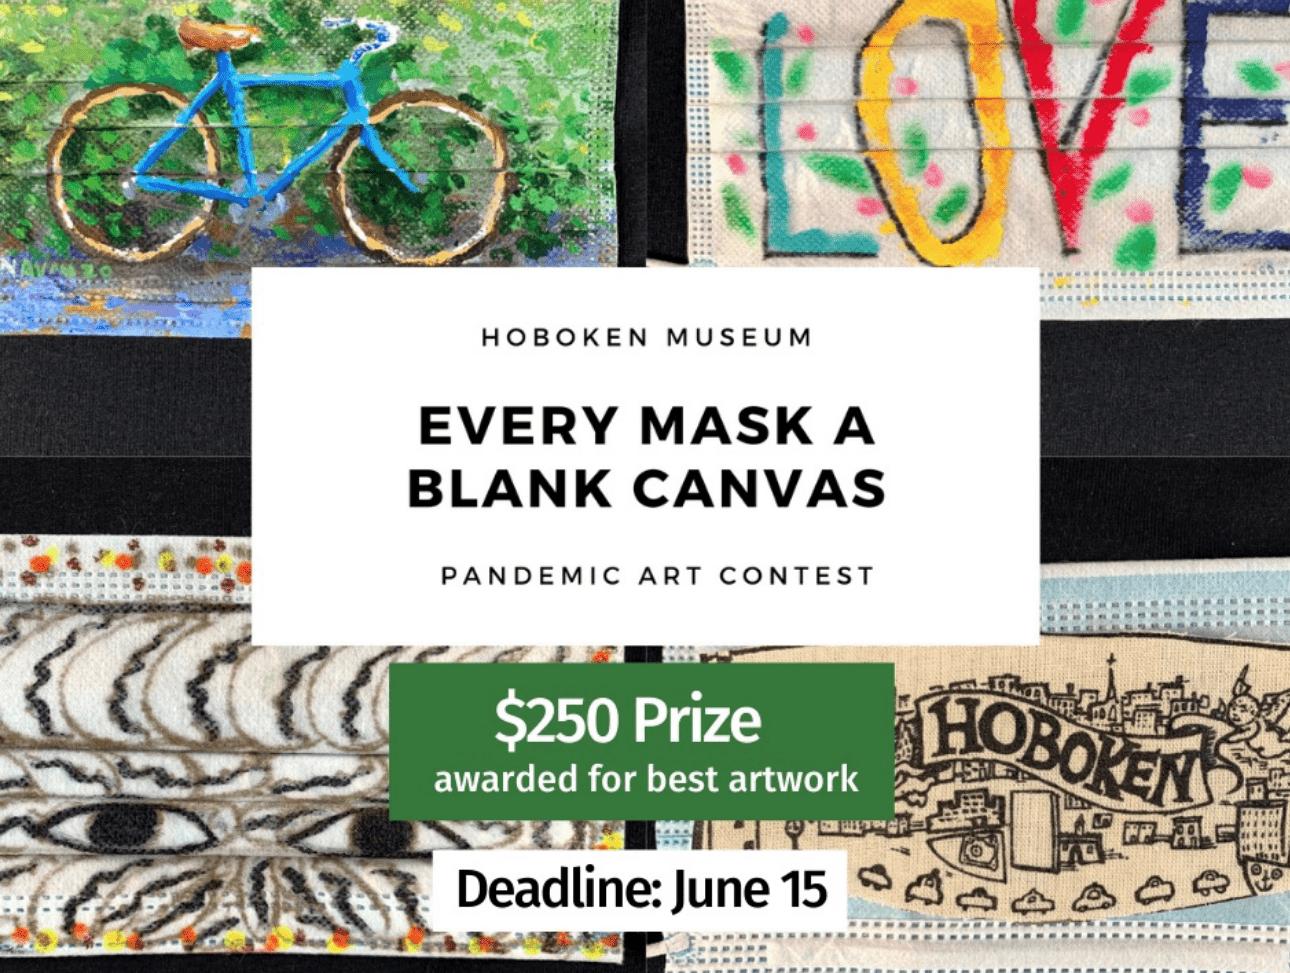 Hoboken Historical Museum Hosts Mask Art Contest